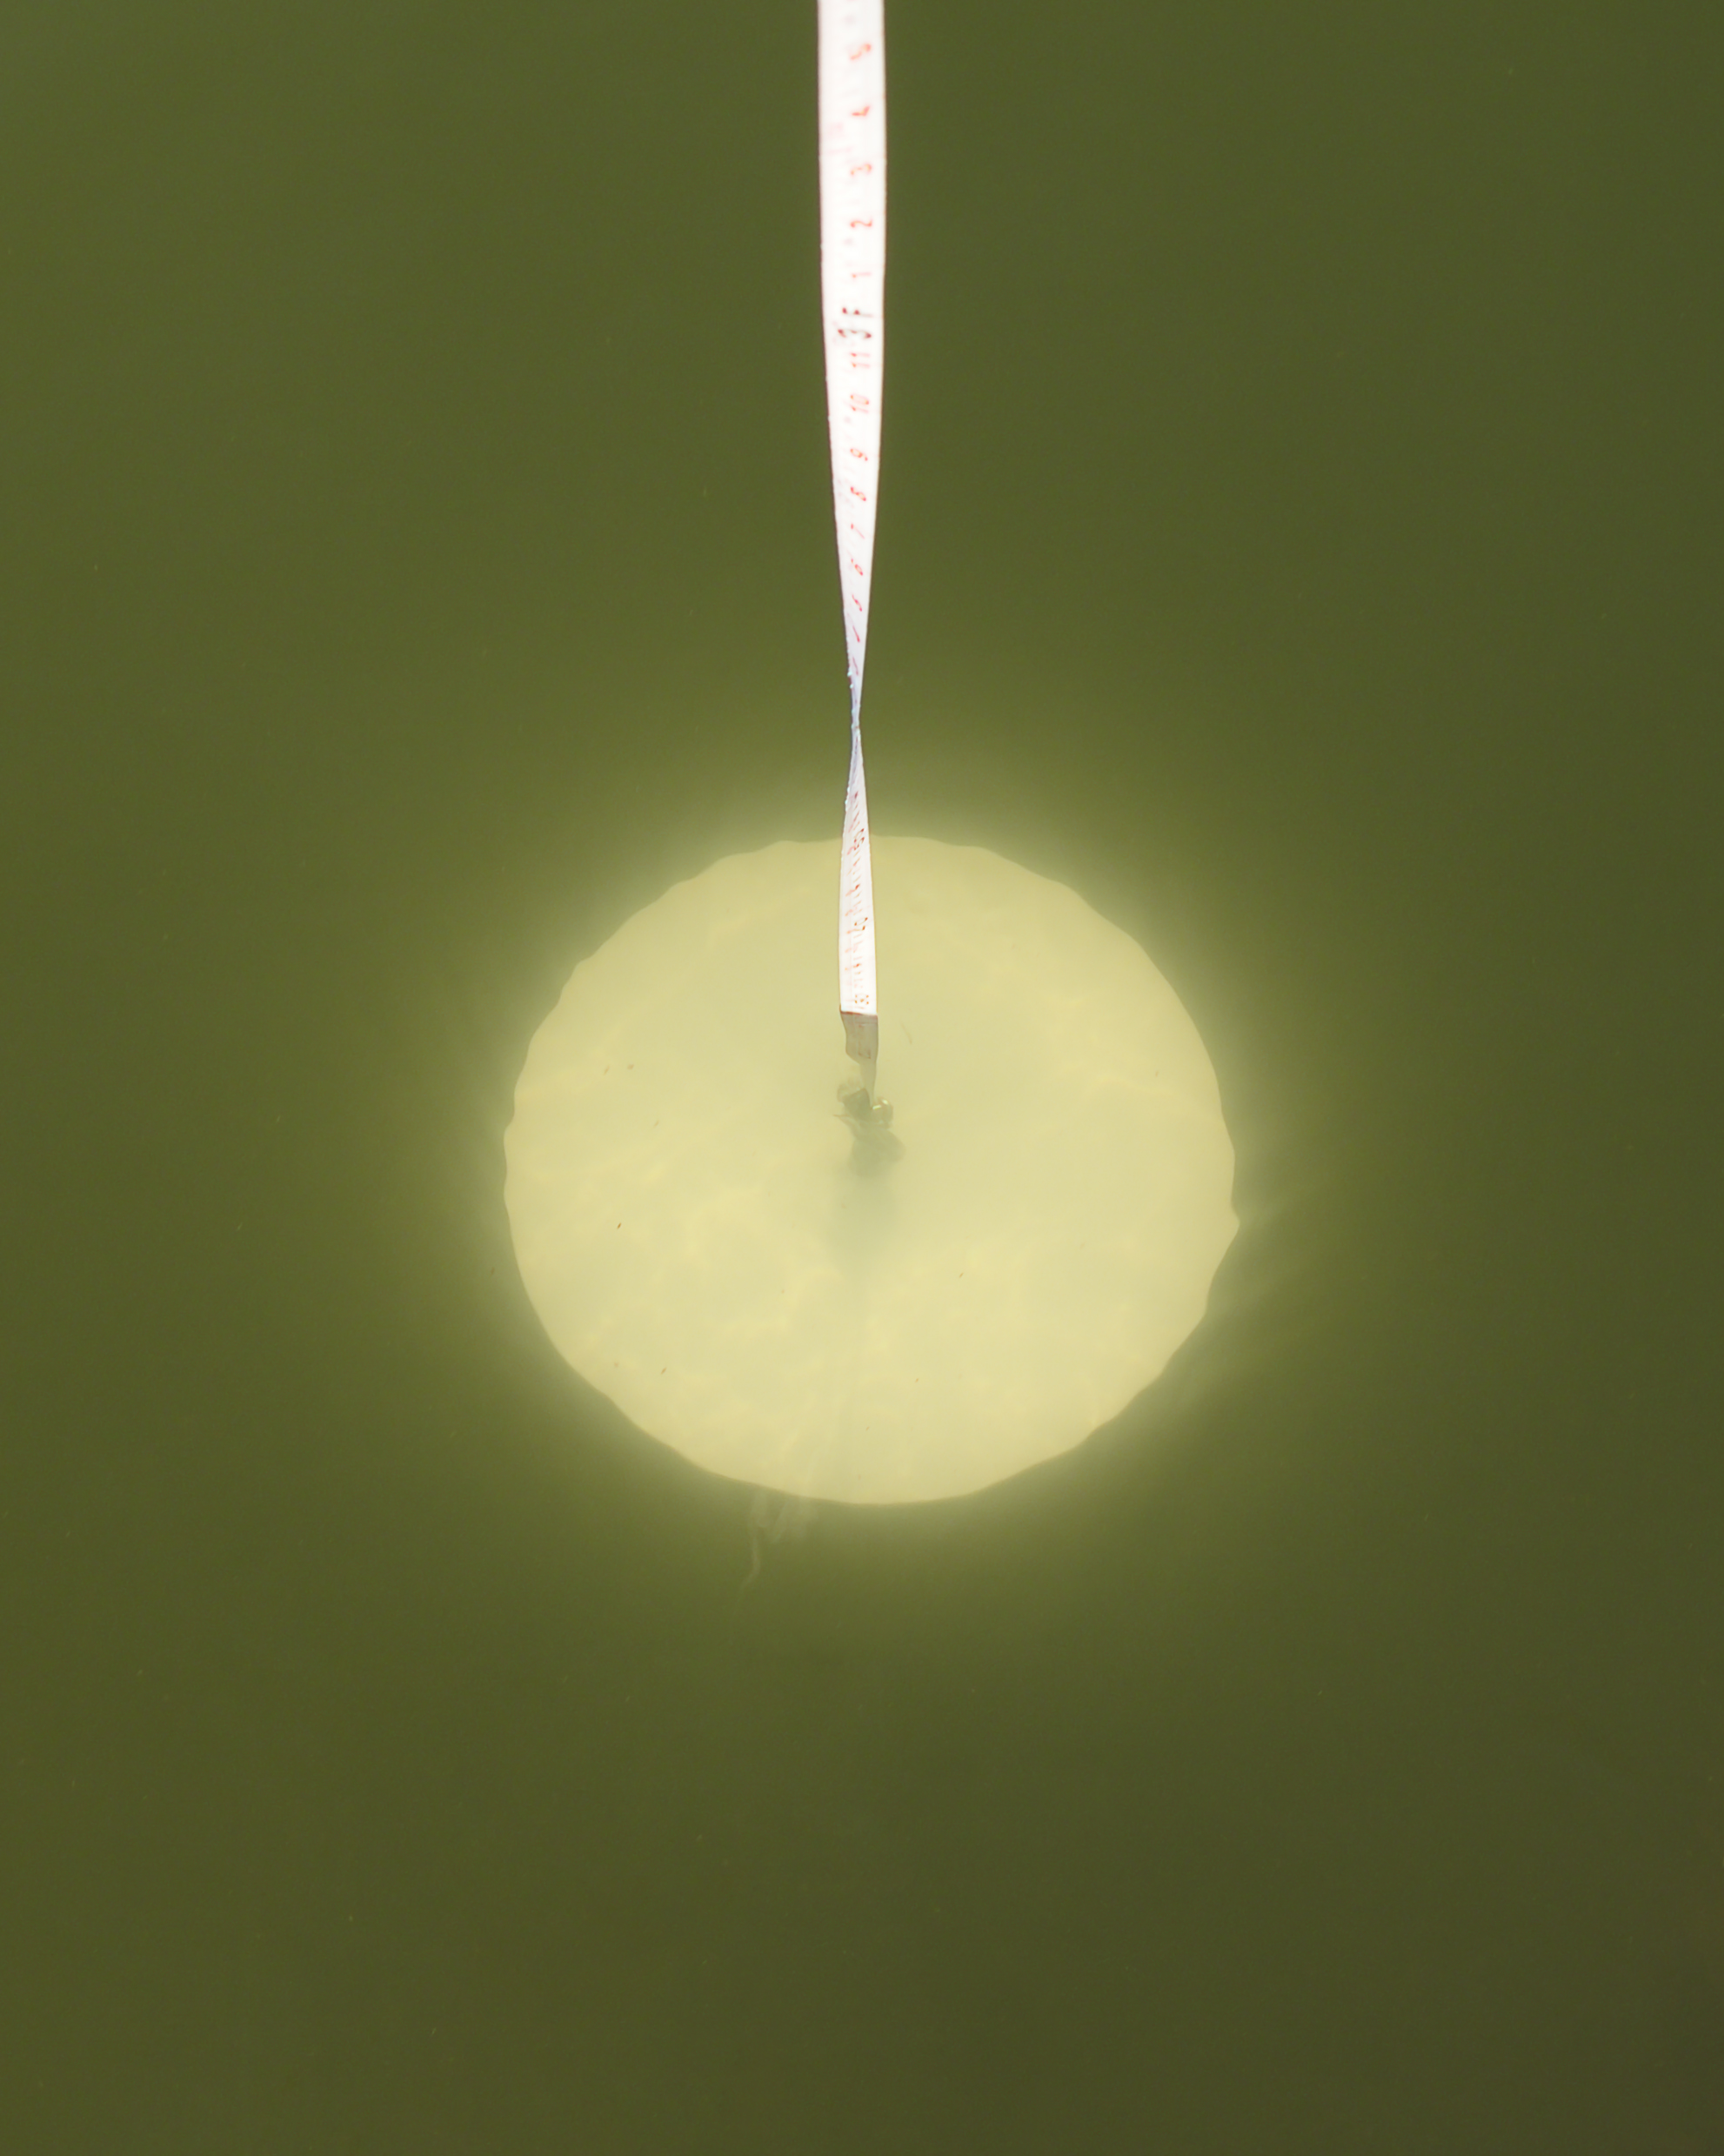 Secchi Disk Underwater.jpg